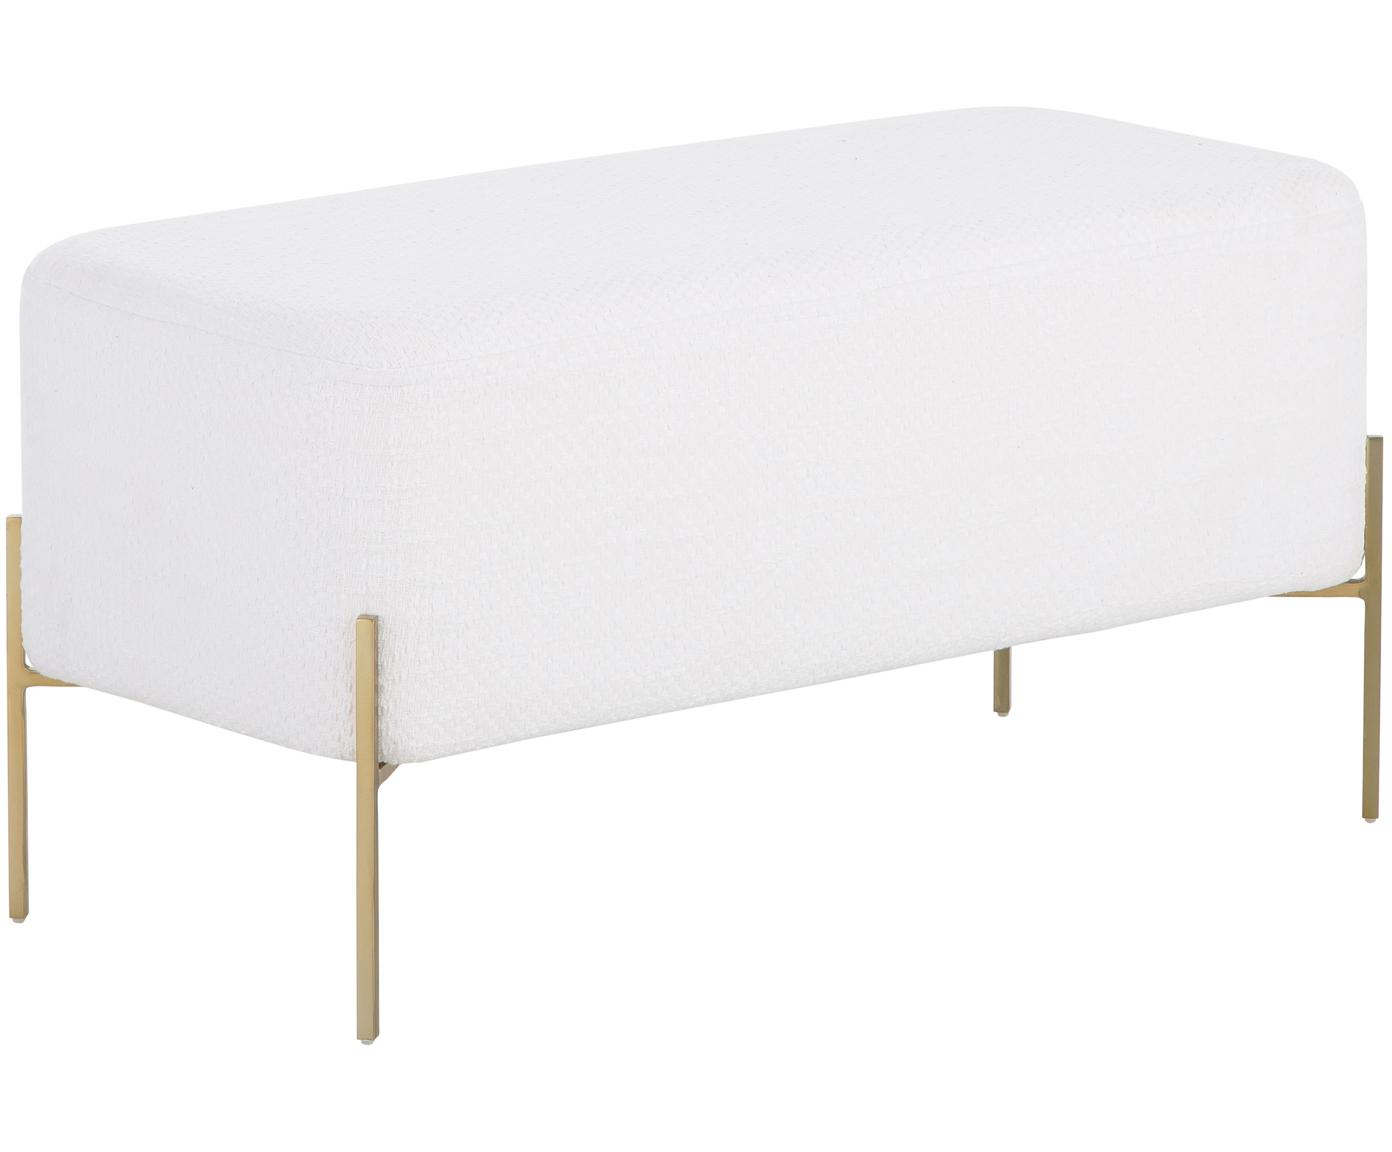 Panca imbottita bouclé Harper, Rivestimento: cotone, Crema, dorato, Larg. 90 x Alt. 44 cm